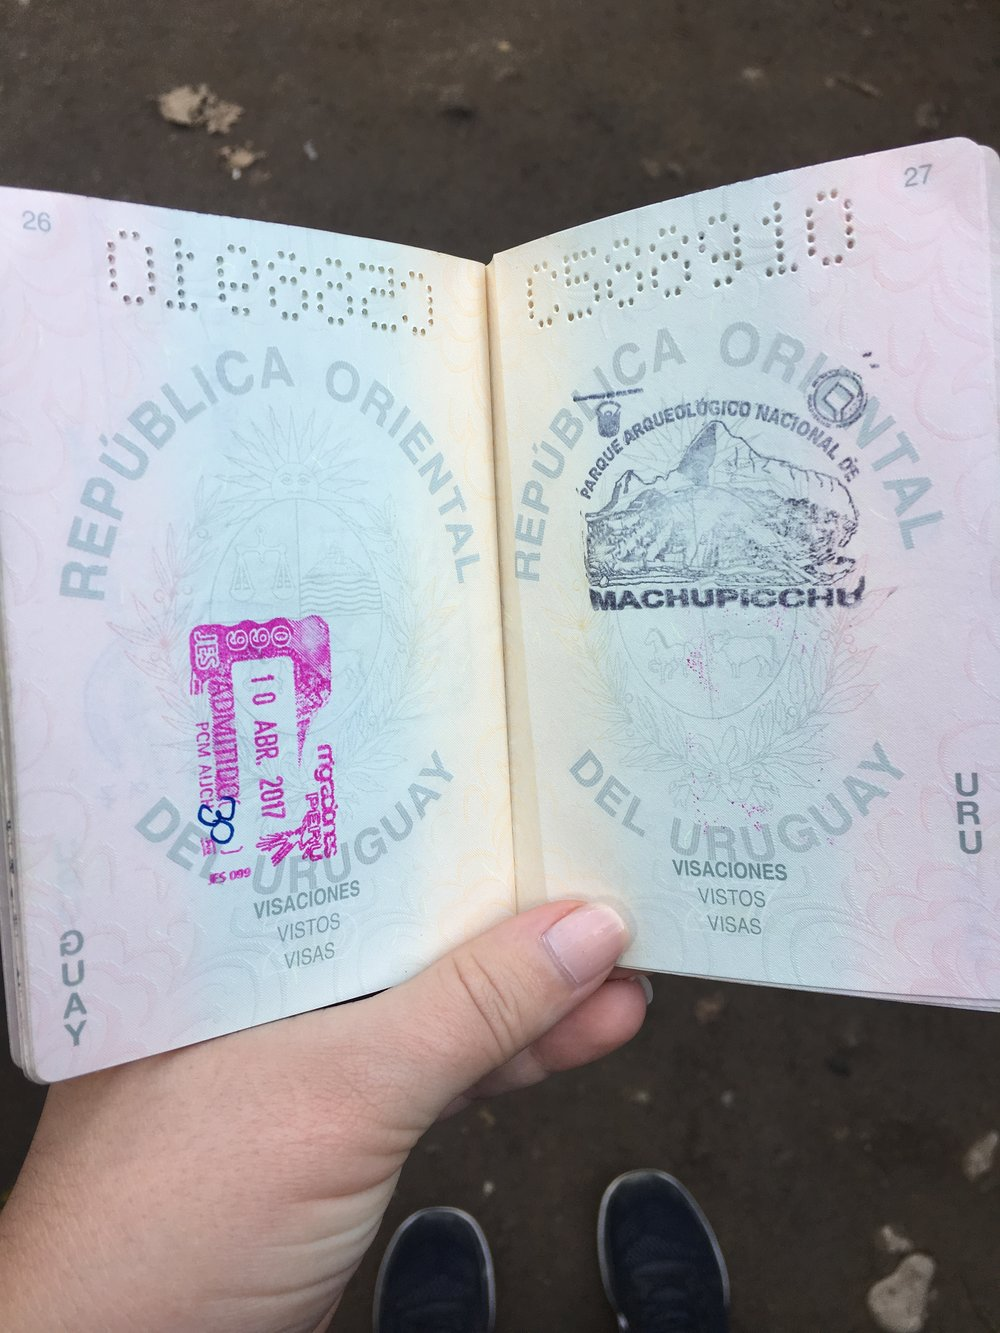 uruguaya-en-machu-picchu.JPG